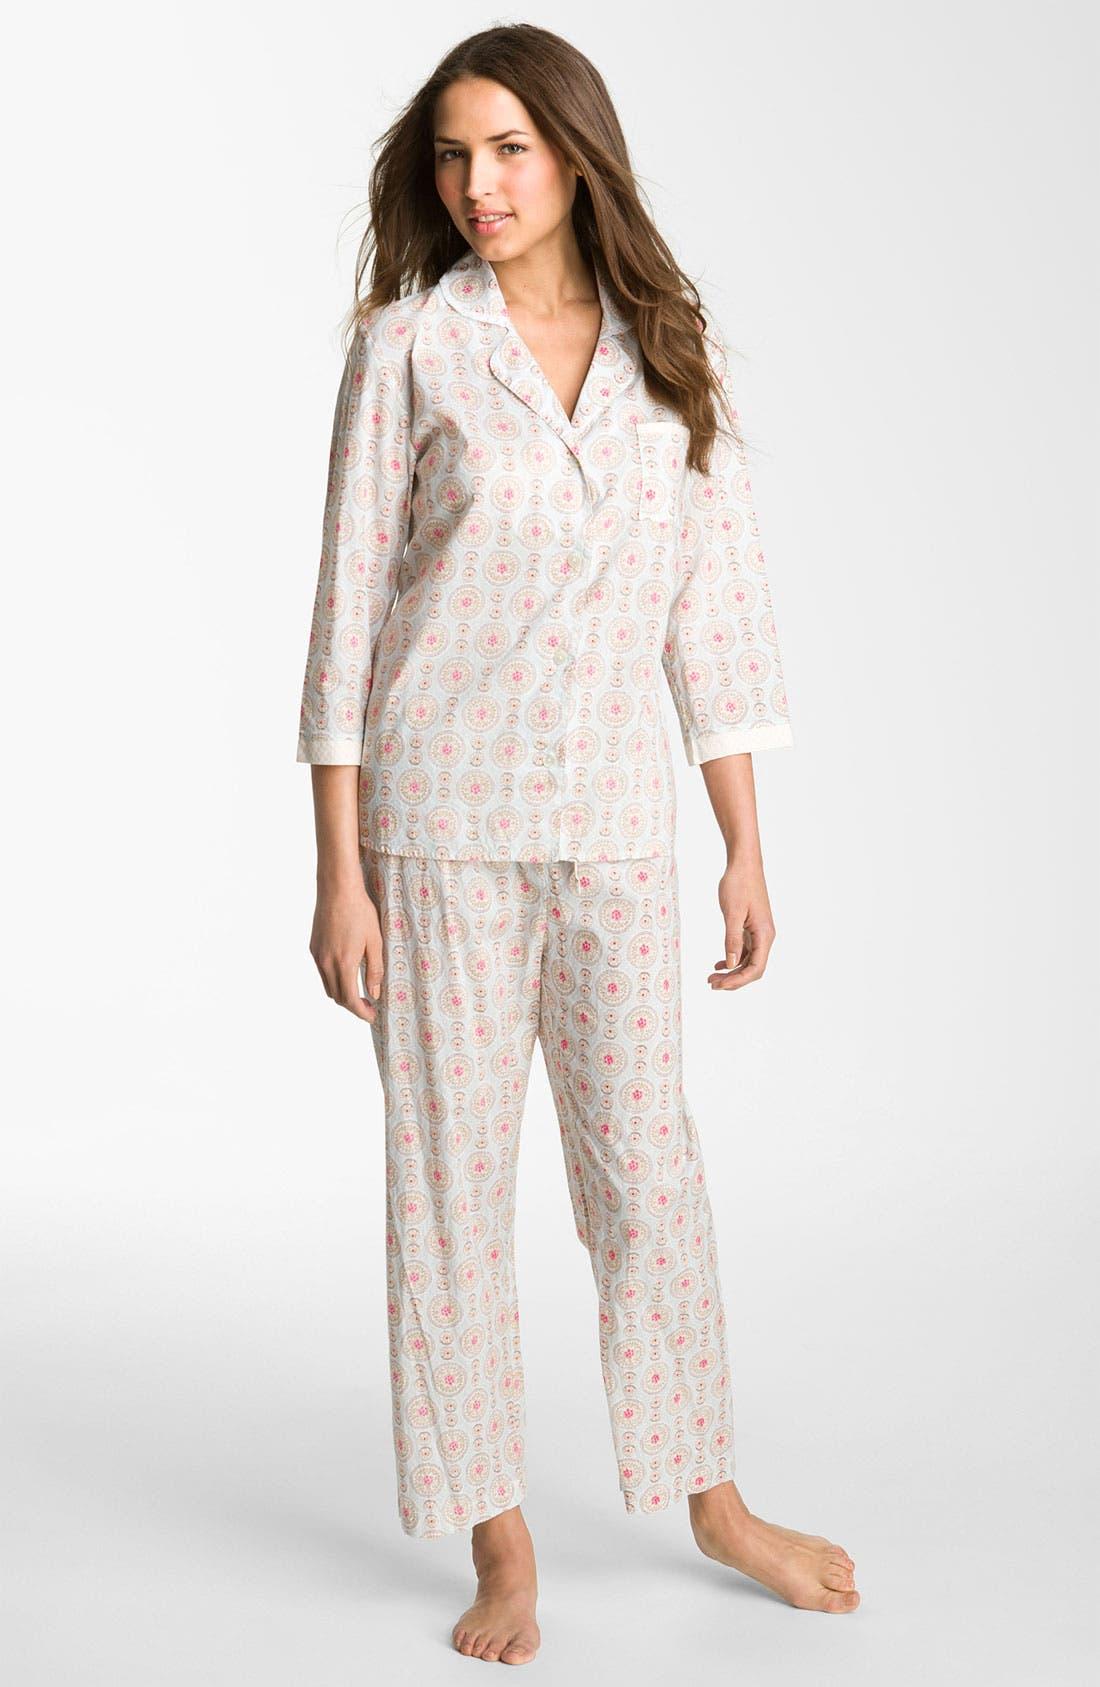 Main Image - Carole Hochman Designs 'Wood Cut Floral' Pajamas